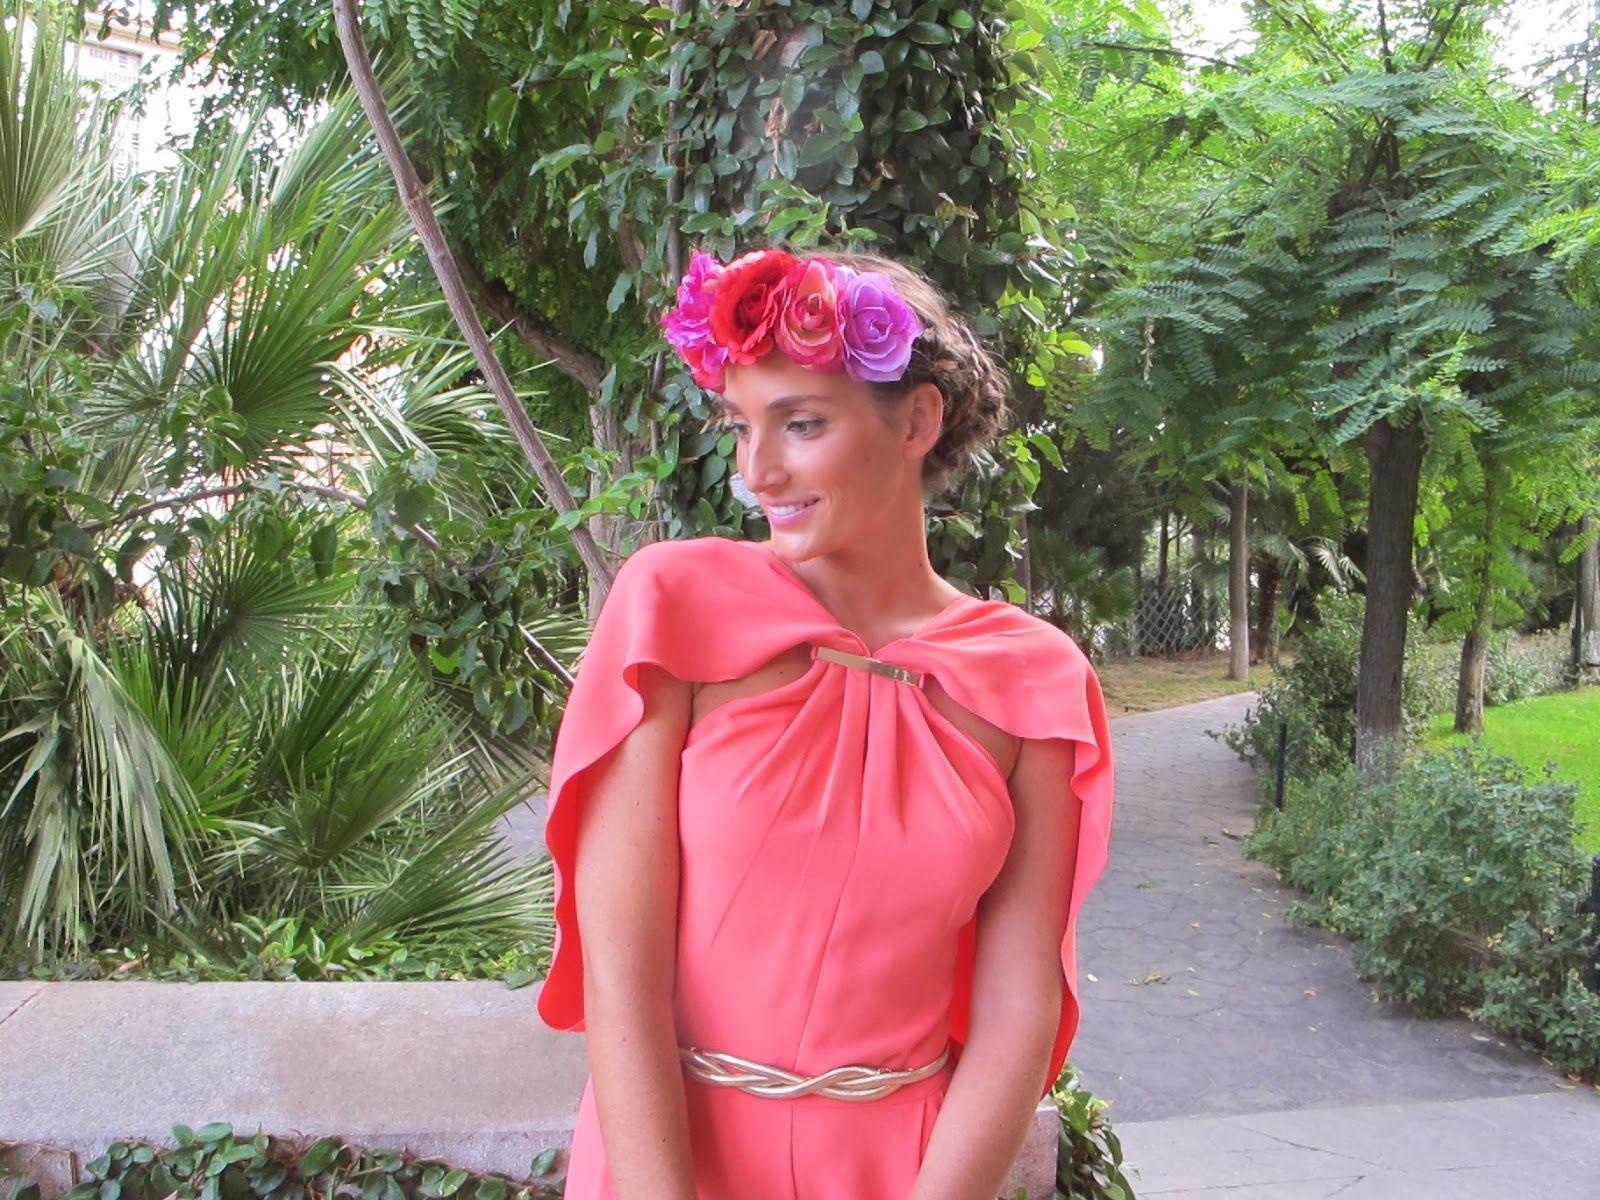 Dorable Vestidos De Novia Con Acentos De Color Rosa Modelo ...